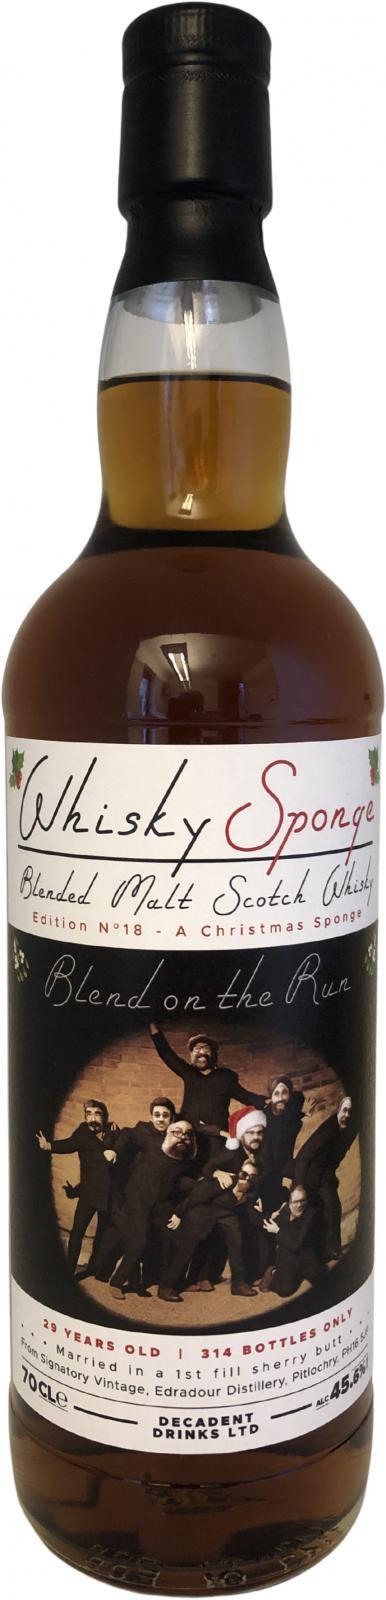 Blended Malt Scotch Whisky 29-year-old WSP